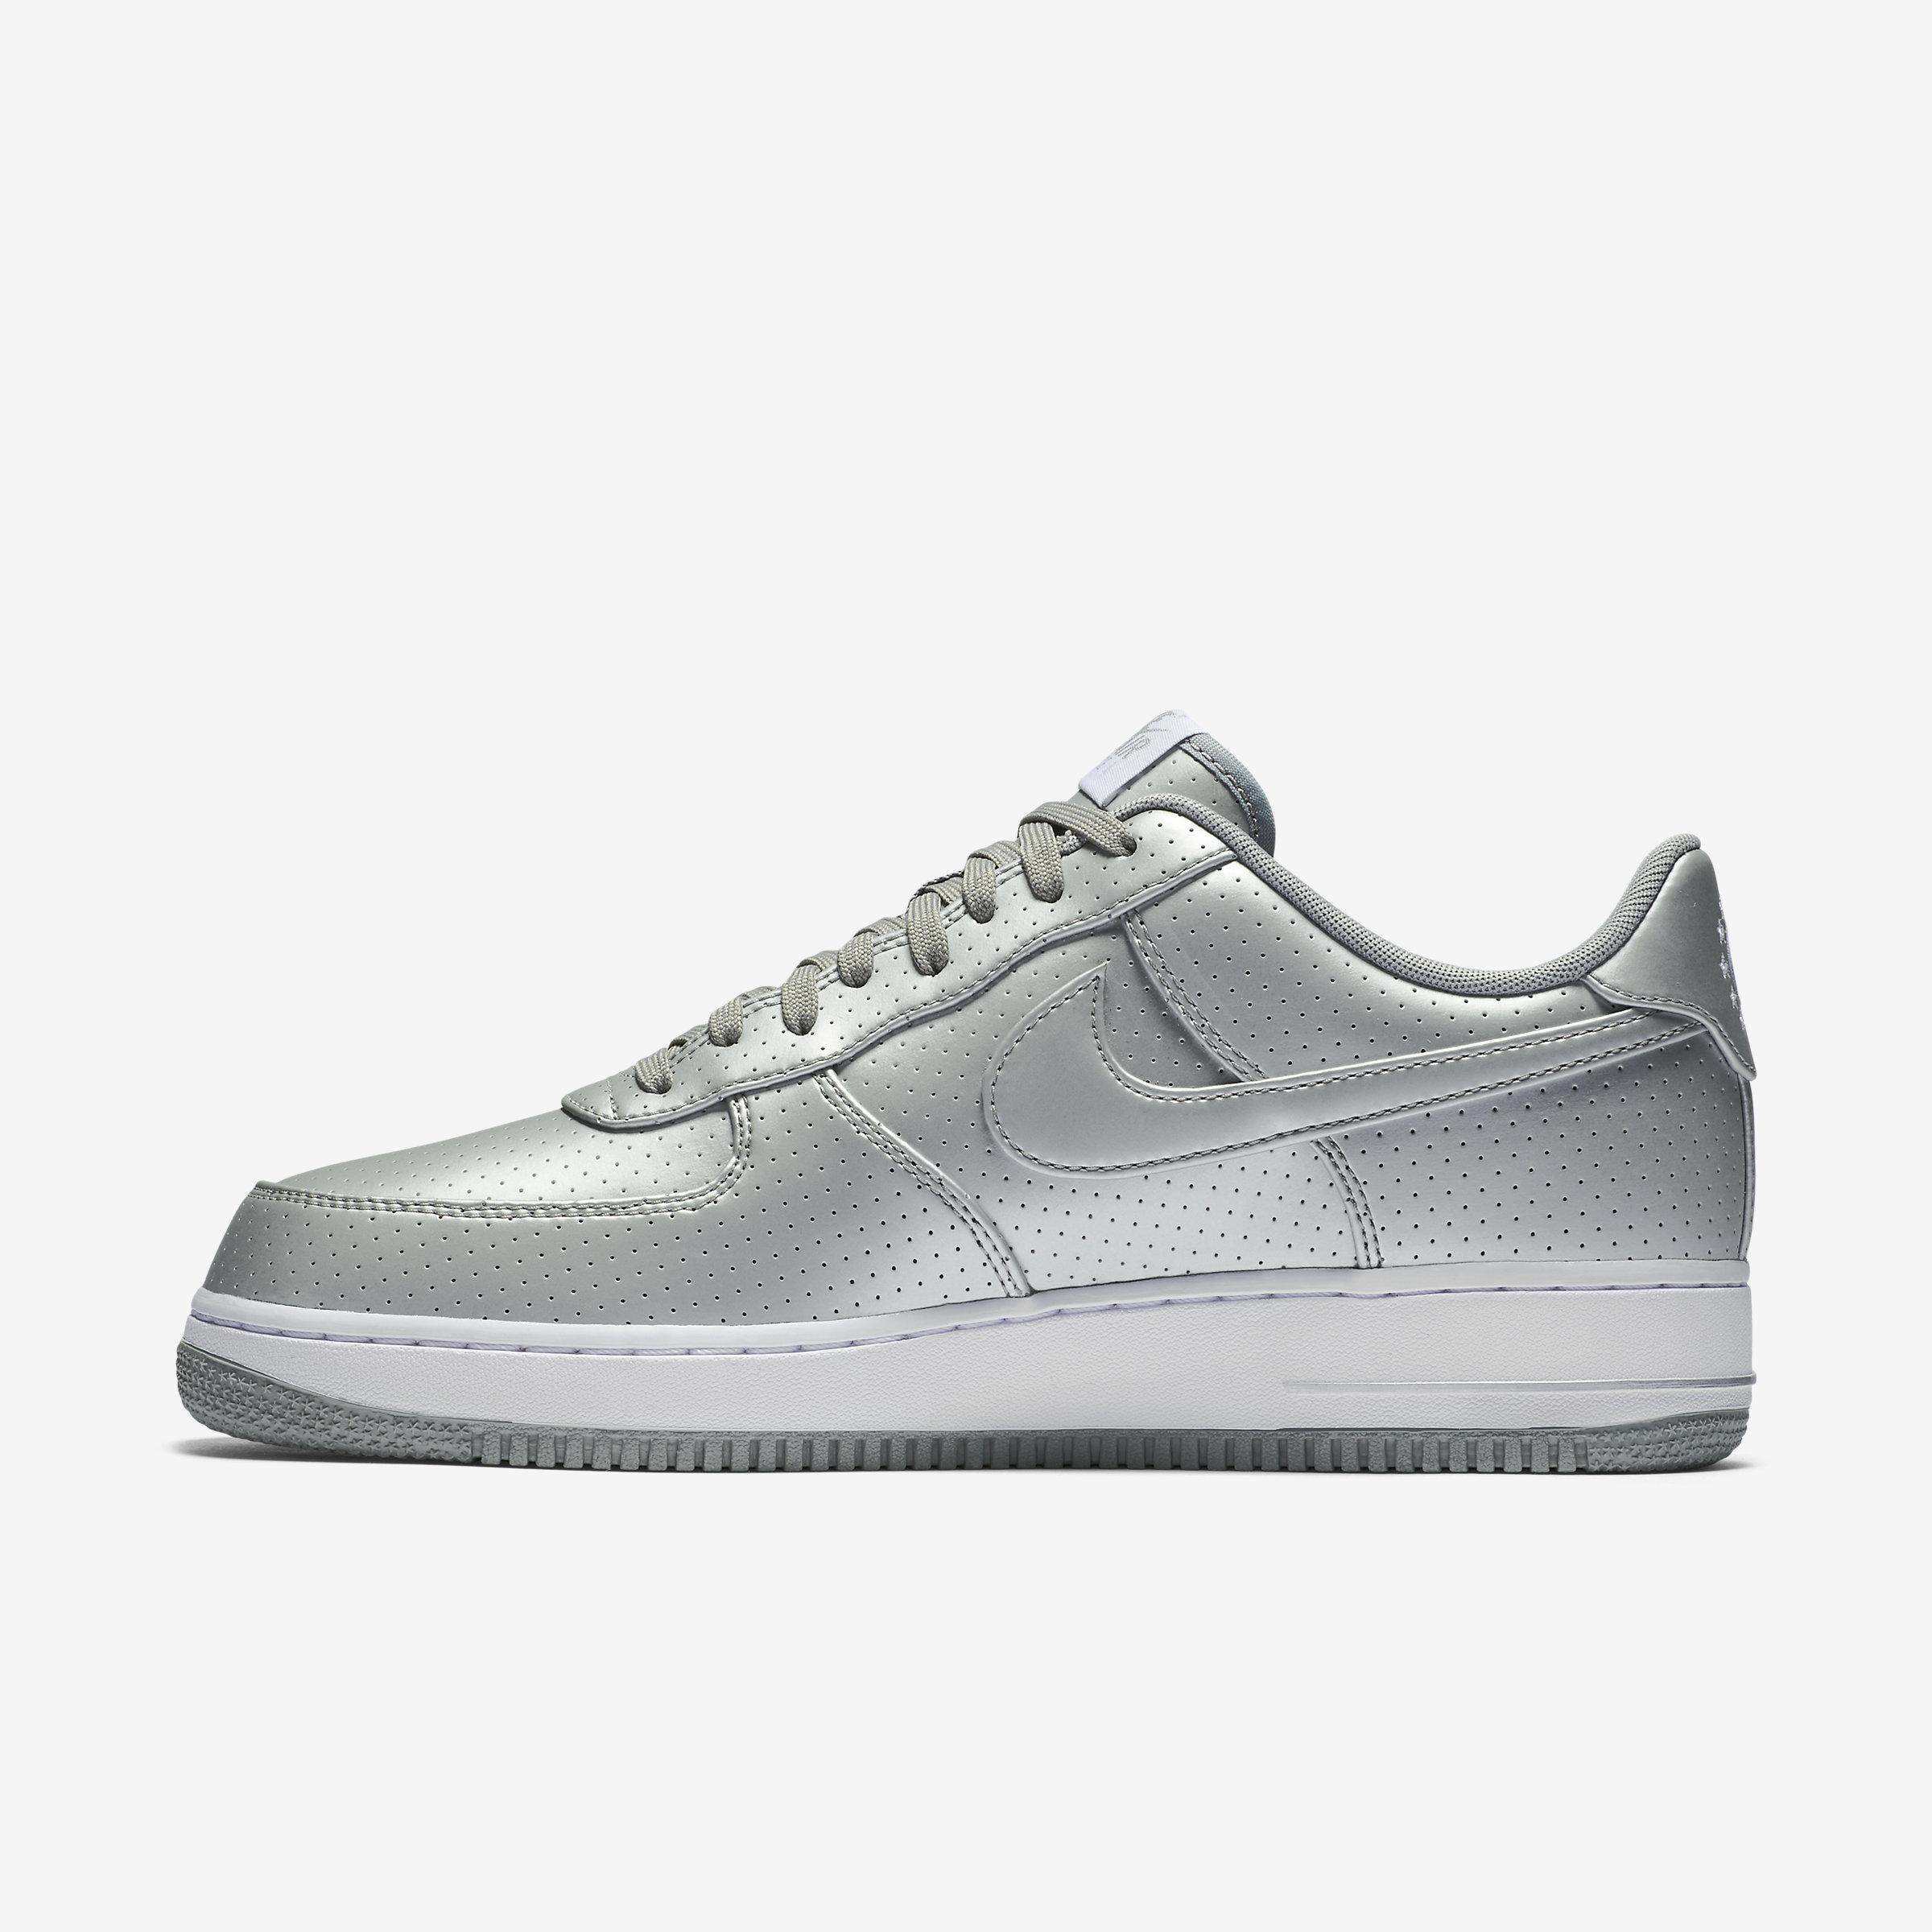 Nike Wool Rosherun Black Sneakers for Men